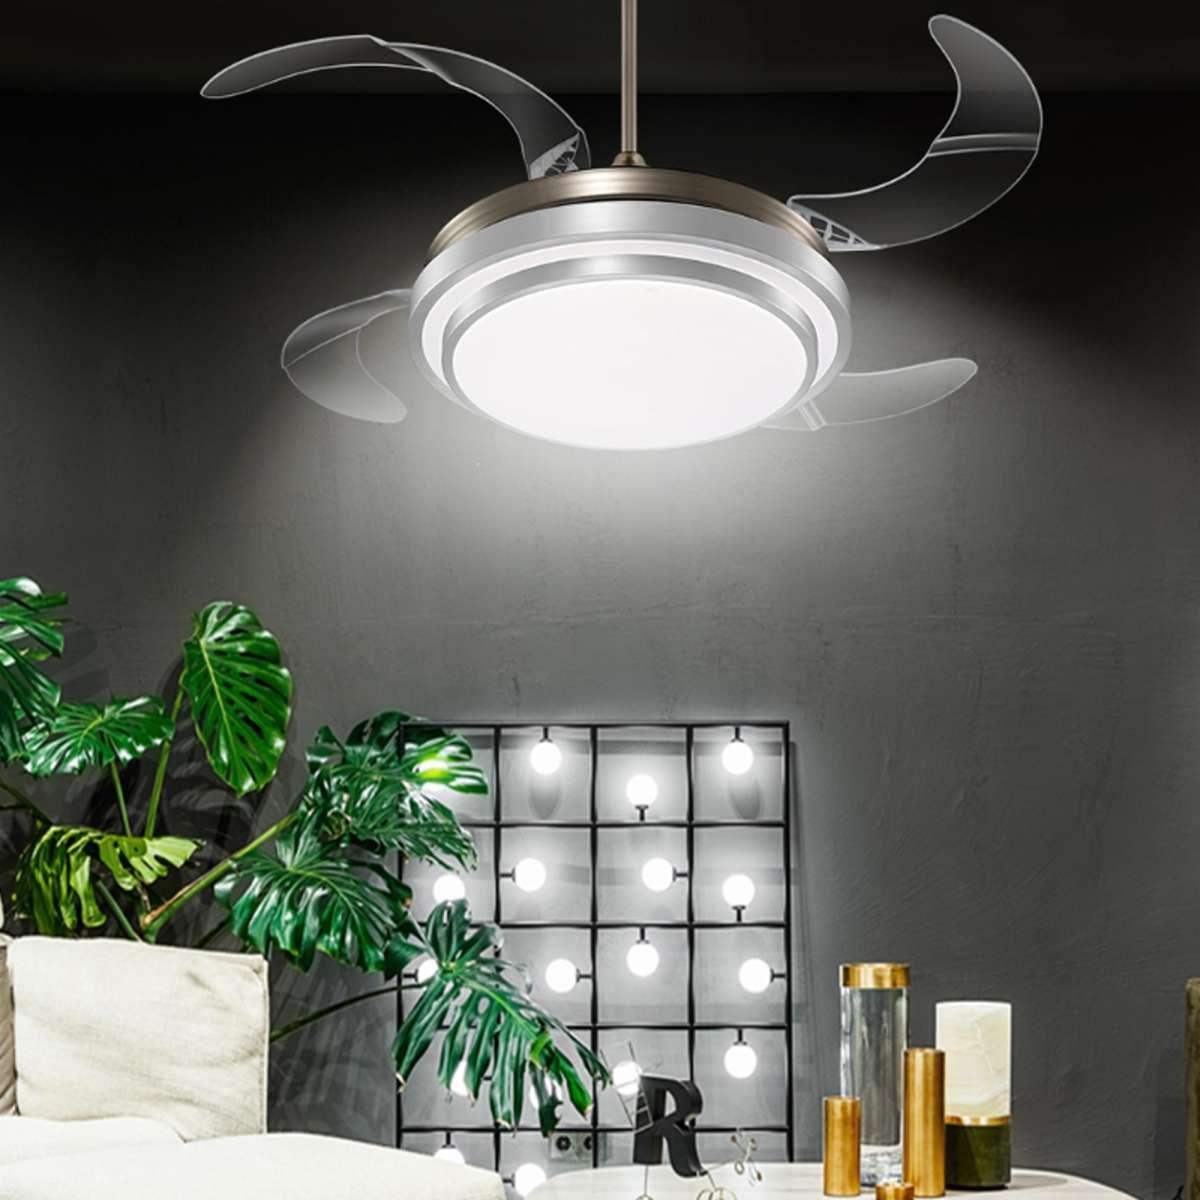 American Retro Restaurant Chandelier Fan Light Ceiling Lights Fan Light Invisible Fan Leaf Bedroom Living Room Room Remote Control Lamp Nclight Fan